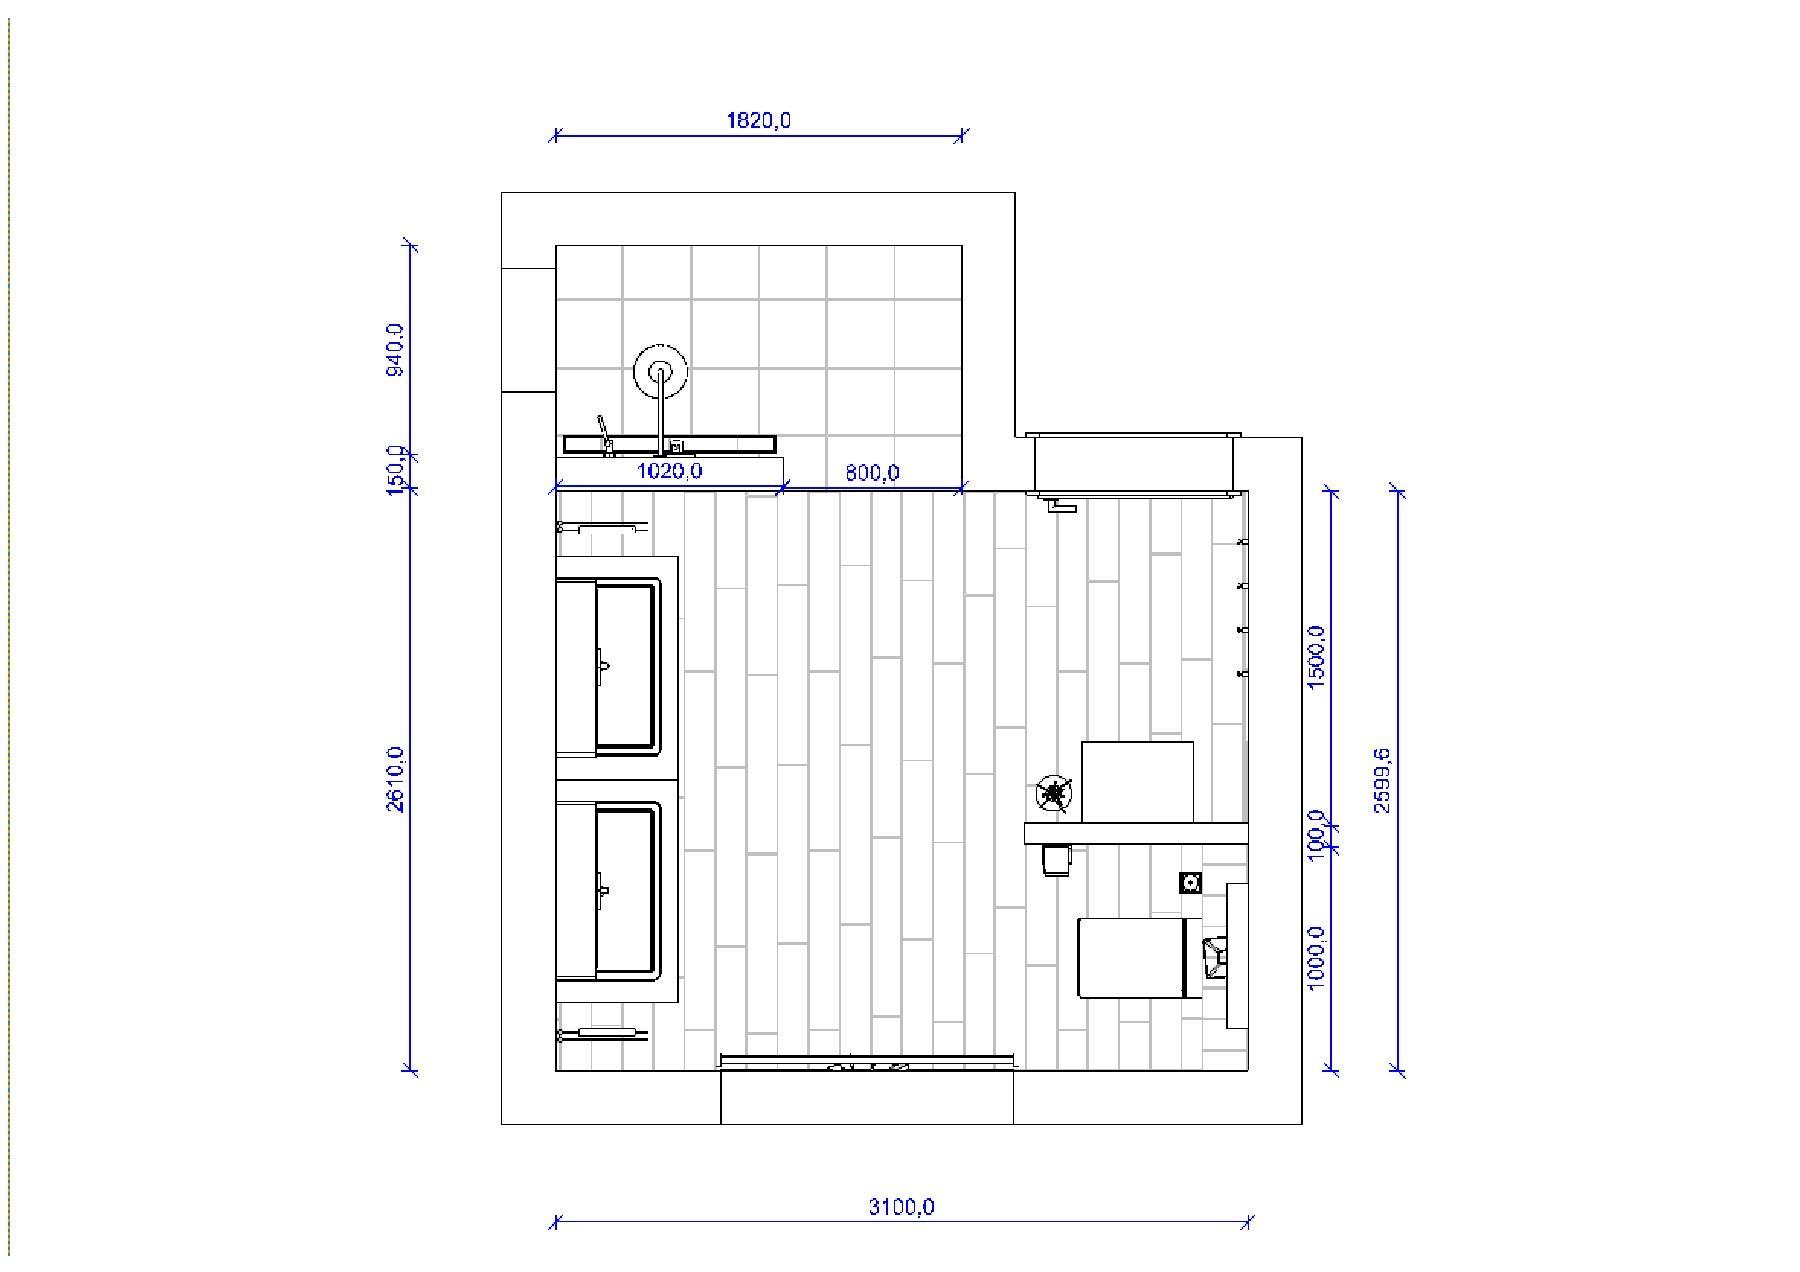 Badezimmer Grundriss Planen. Large Size Of Badezimmer Grundriss